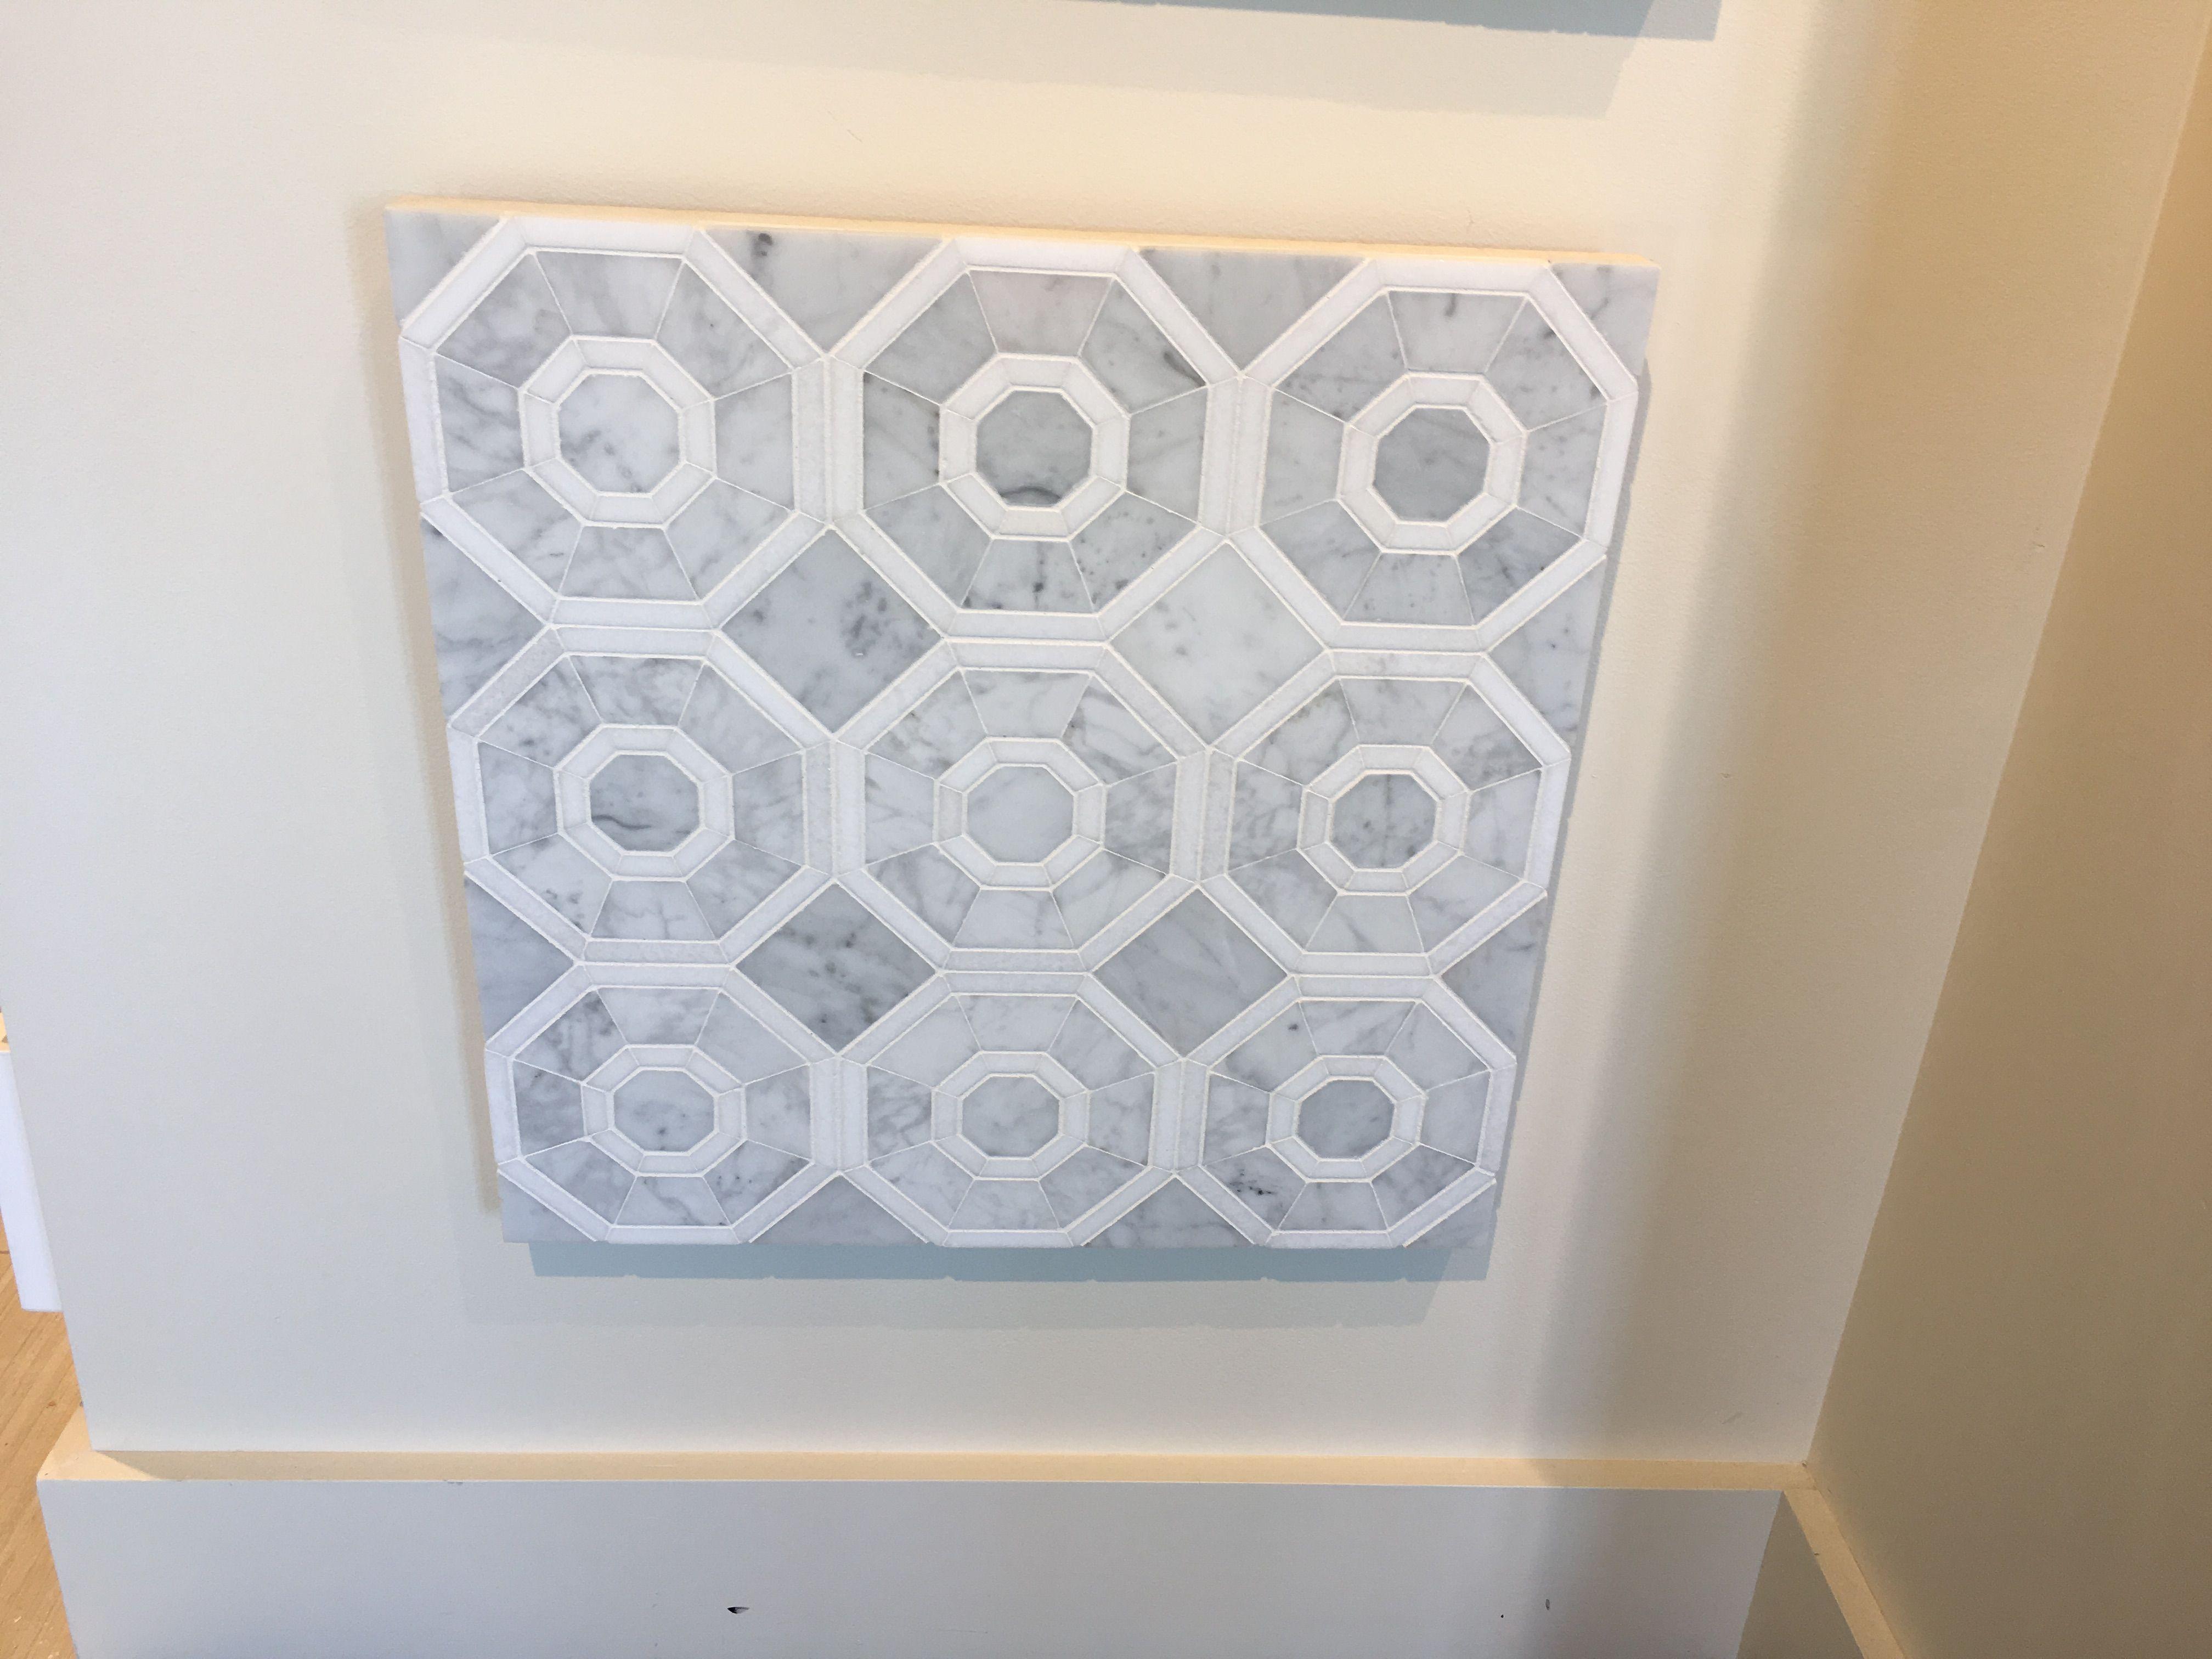 White Carrara Venatino (Premium) Marble By OFI. Tile Showcase